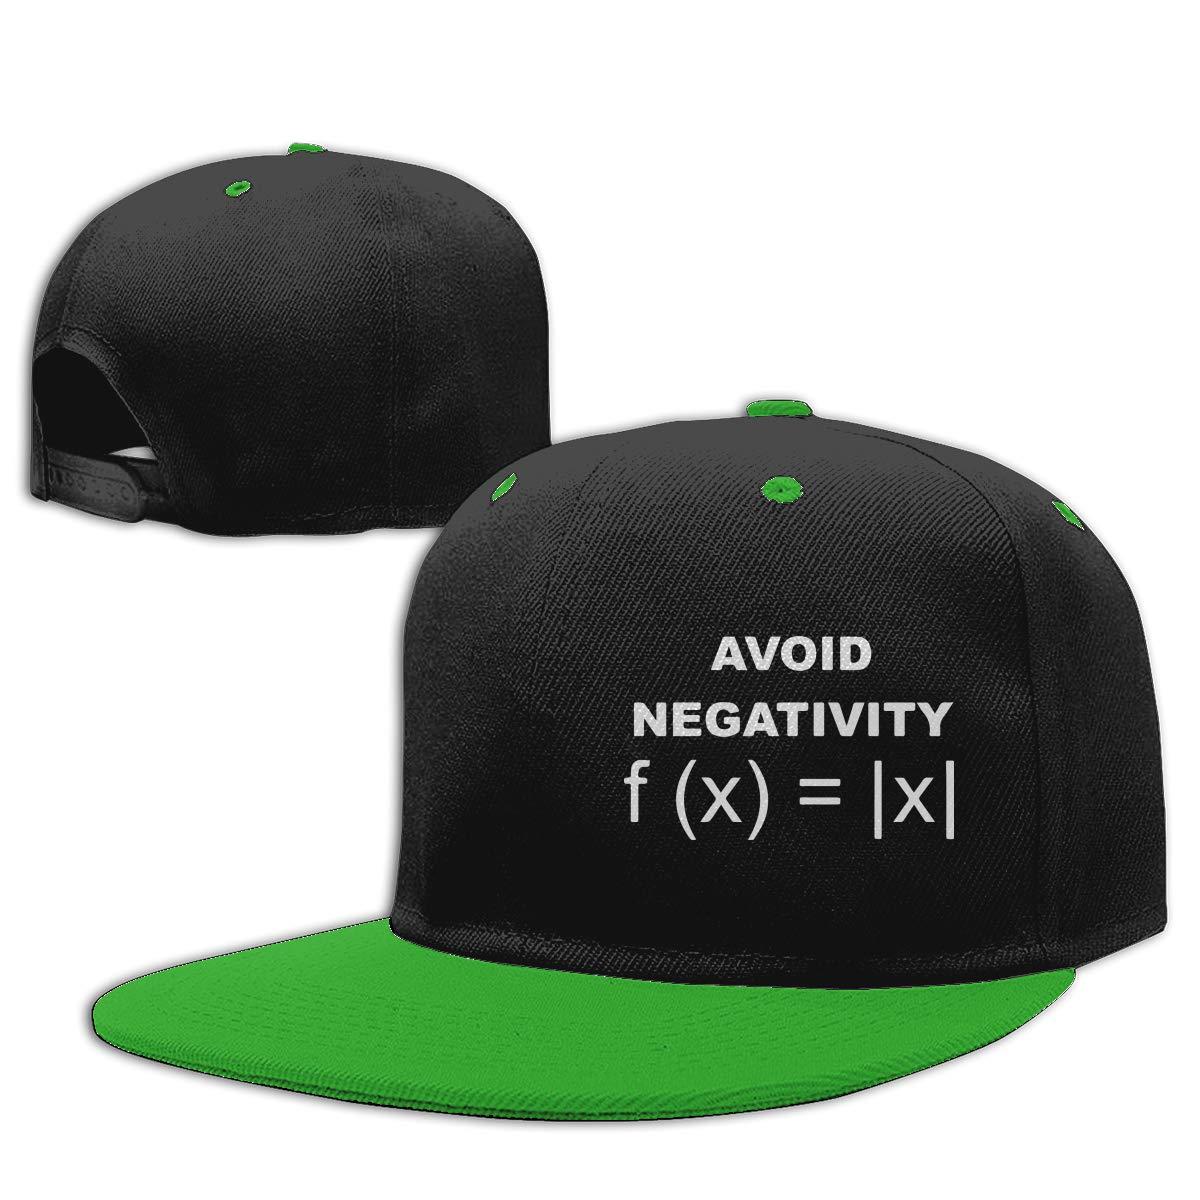 NMG-01 Men Womens Snapback Cap Avoid Negativity Funny Math Adjustable Flat Brim Baseball Caps